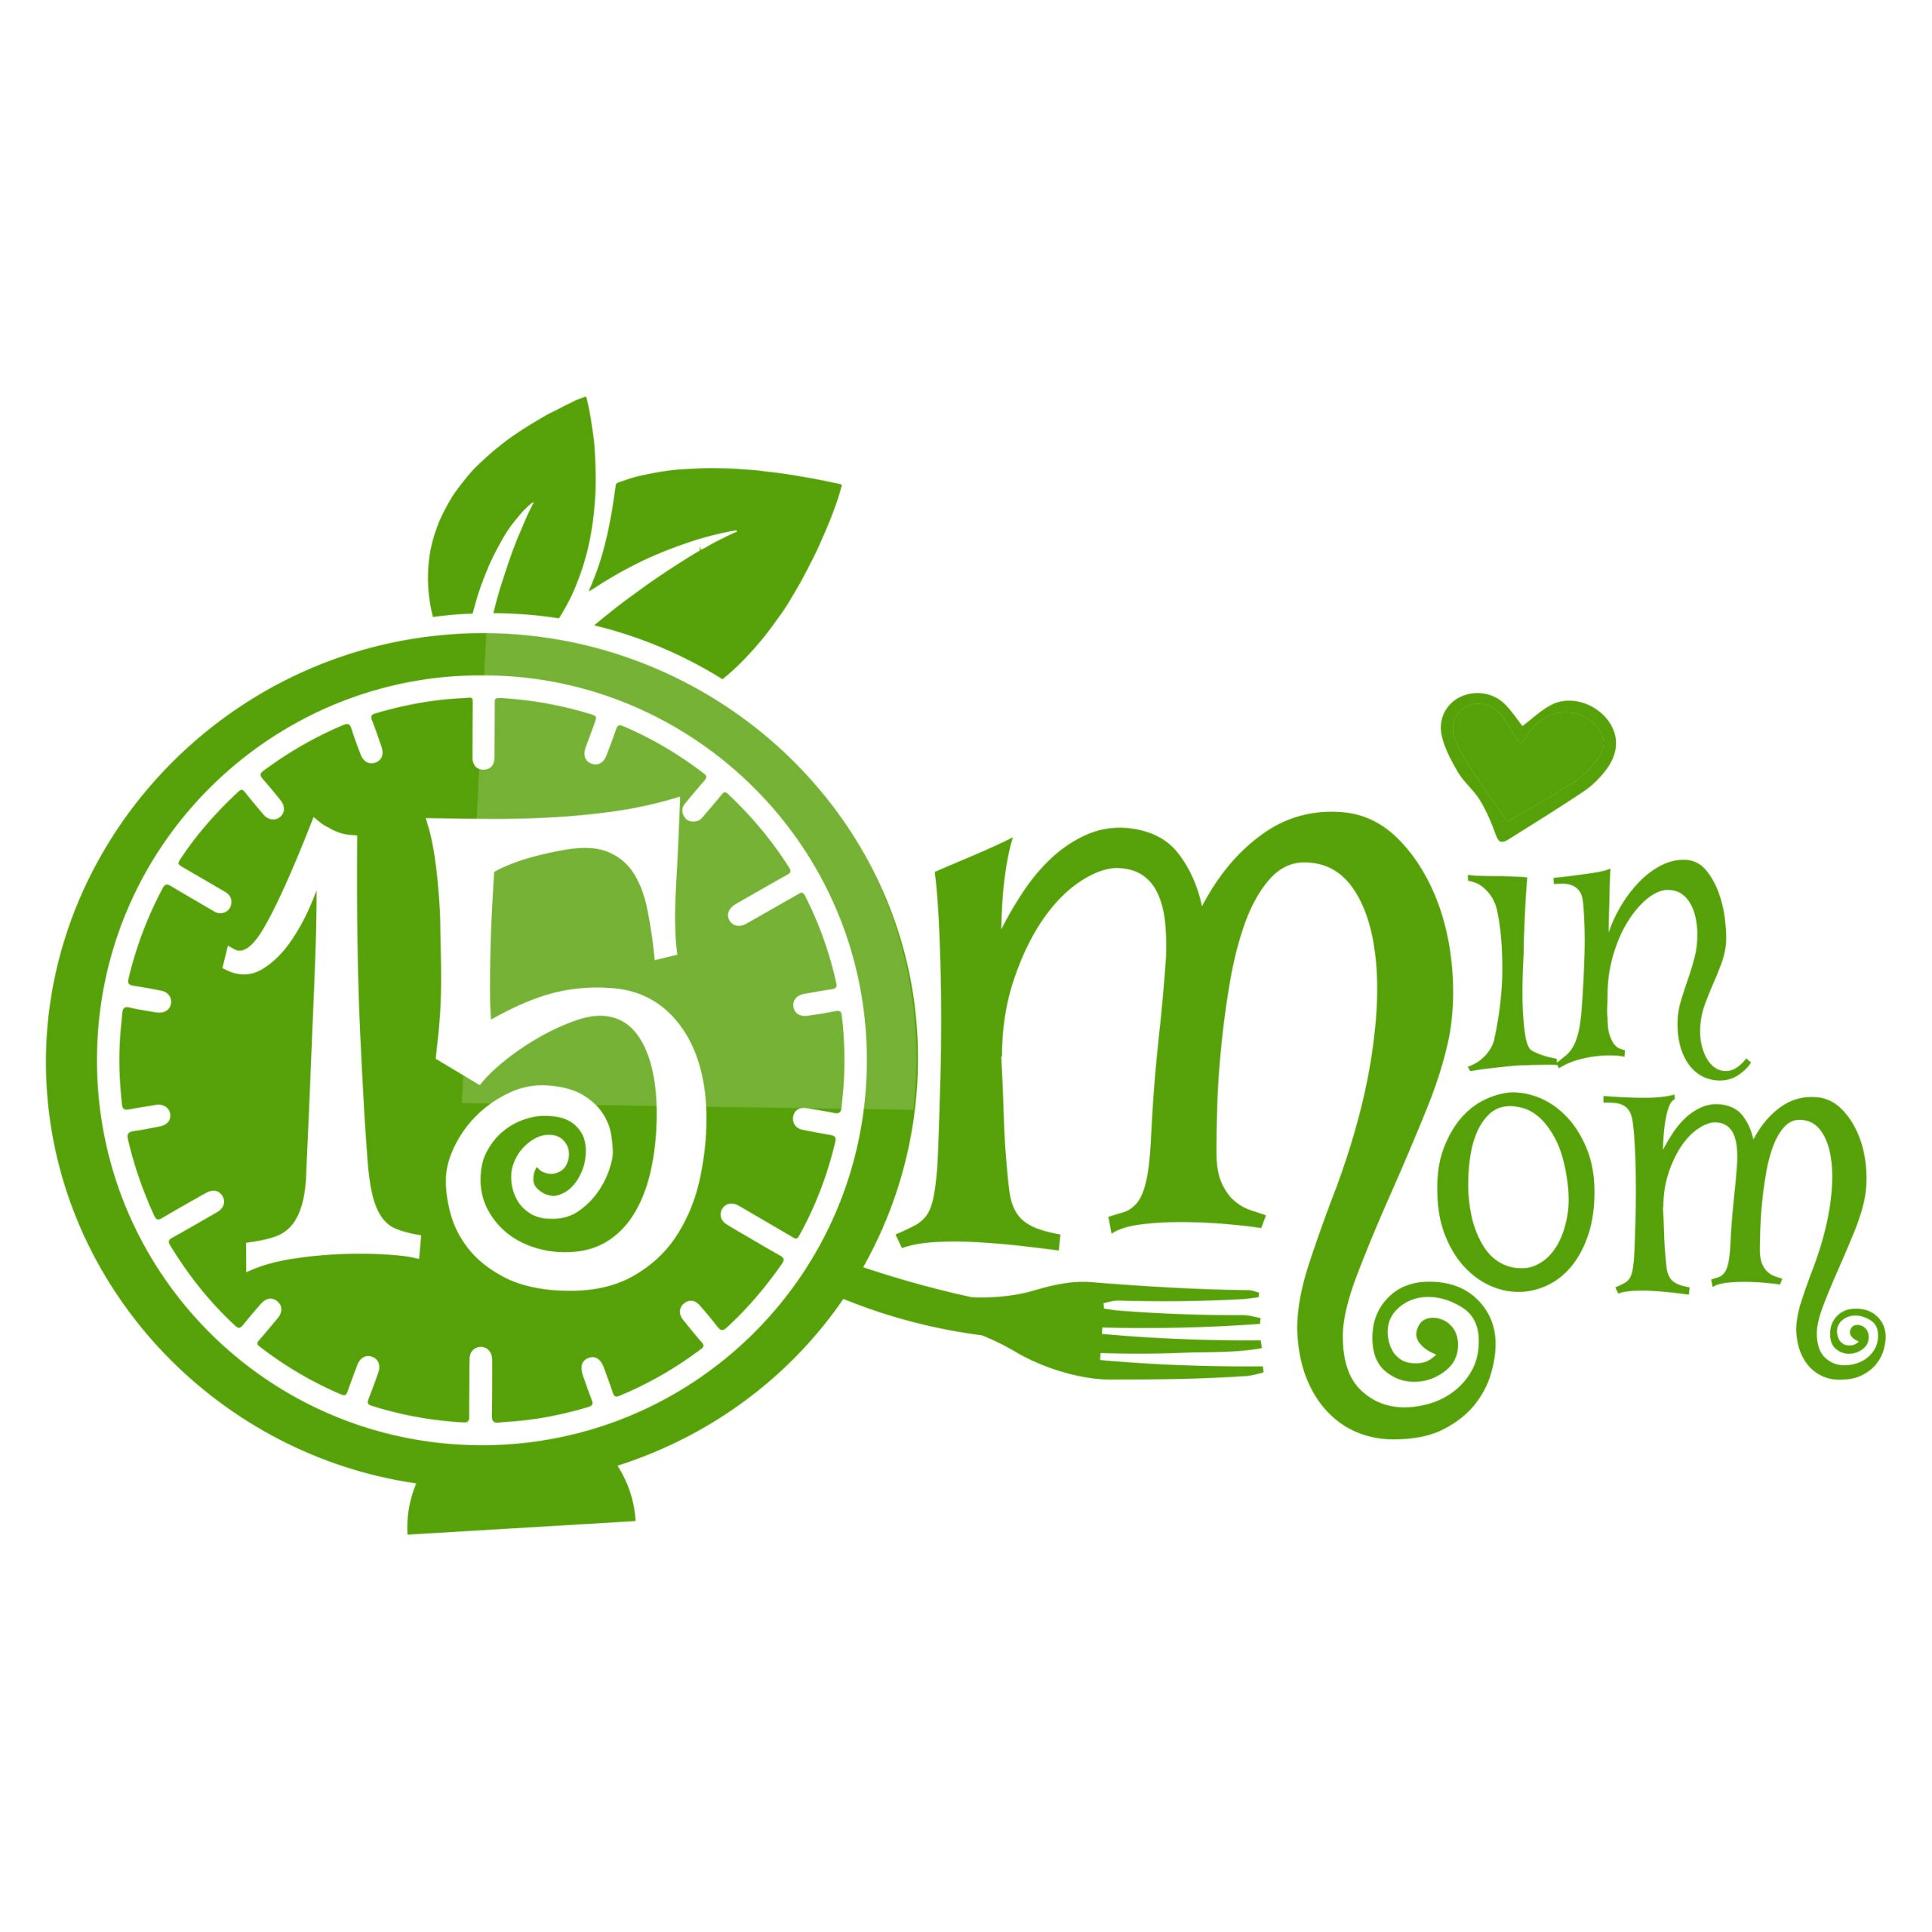 15 Min Mom